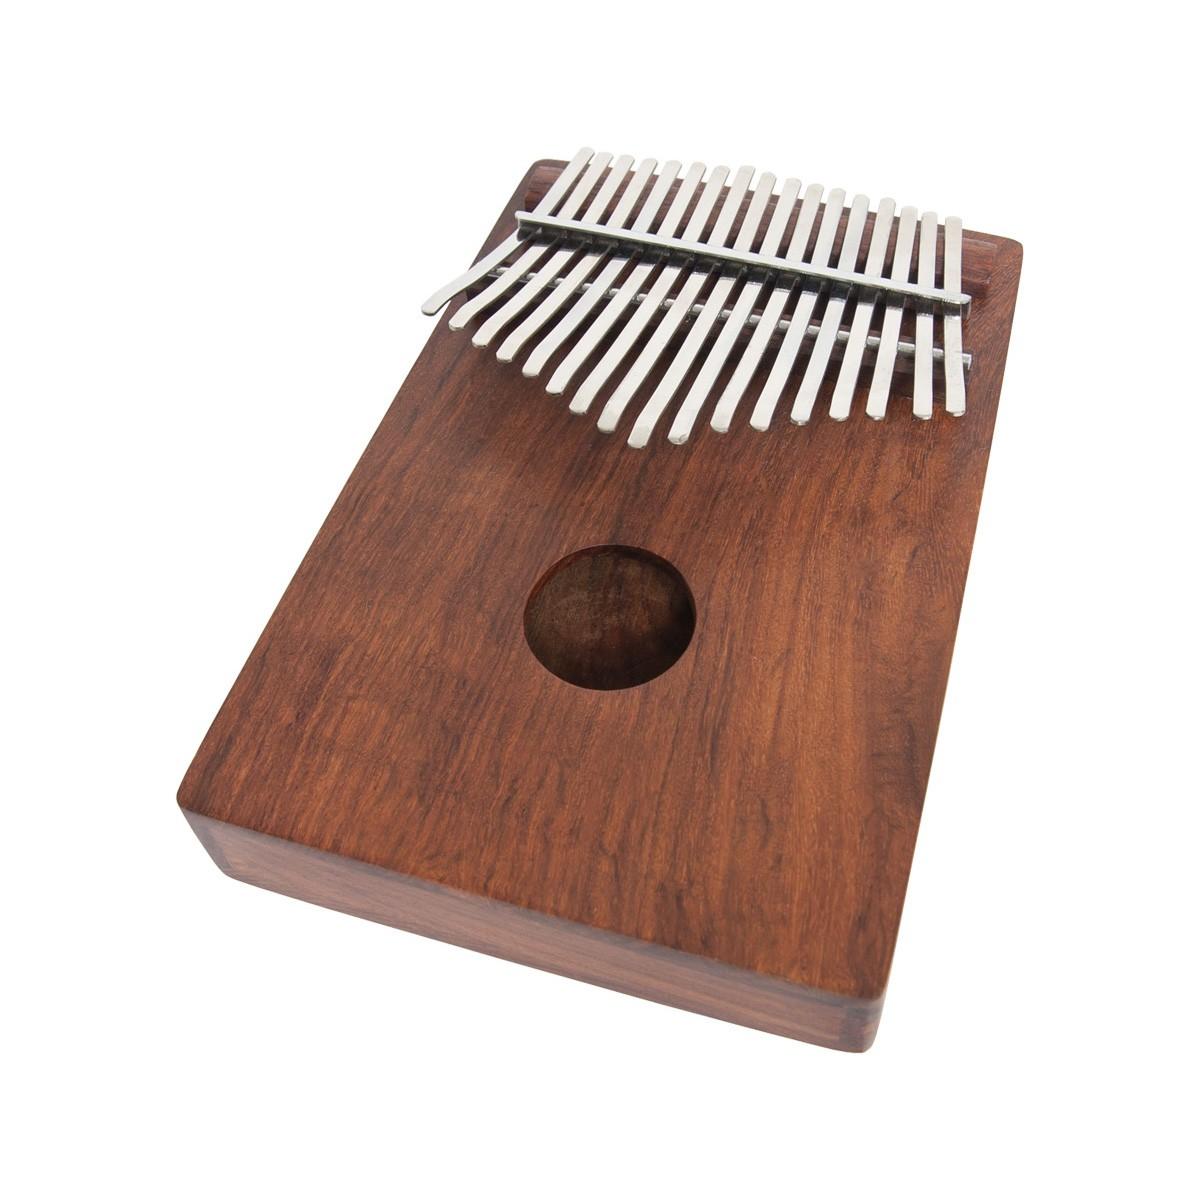 DOBANI 17-Key Thumb Piano